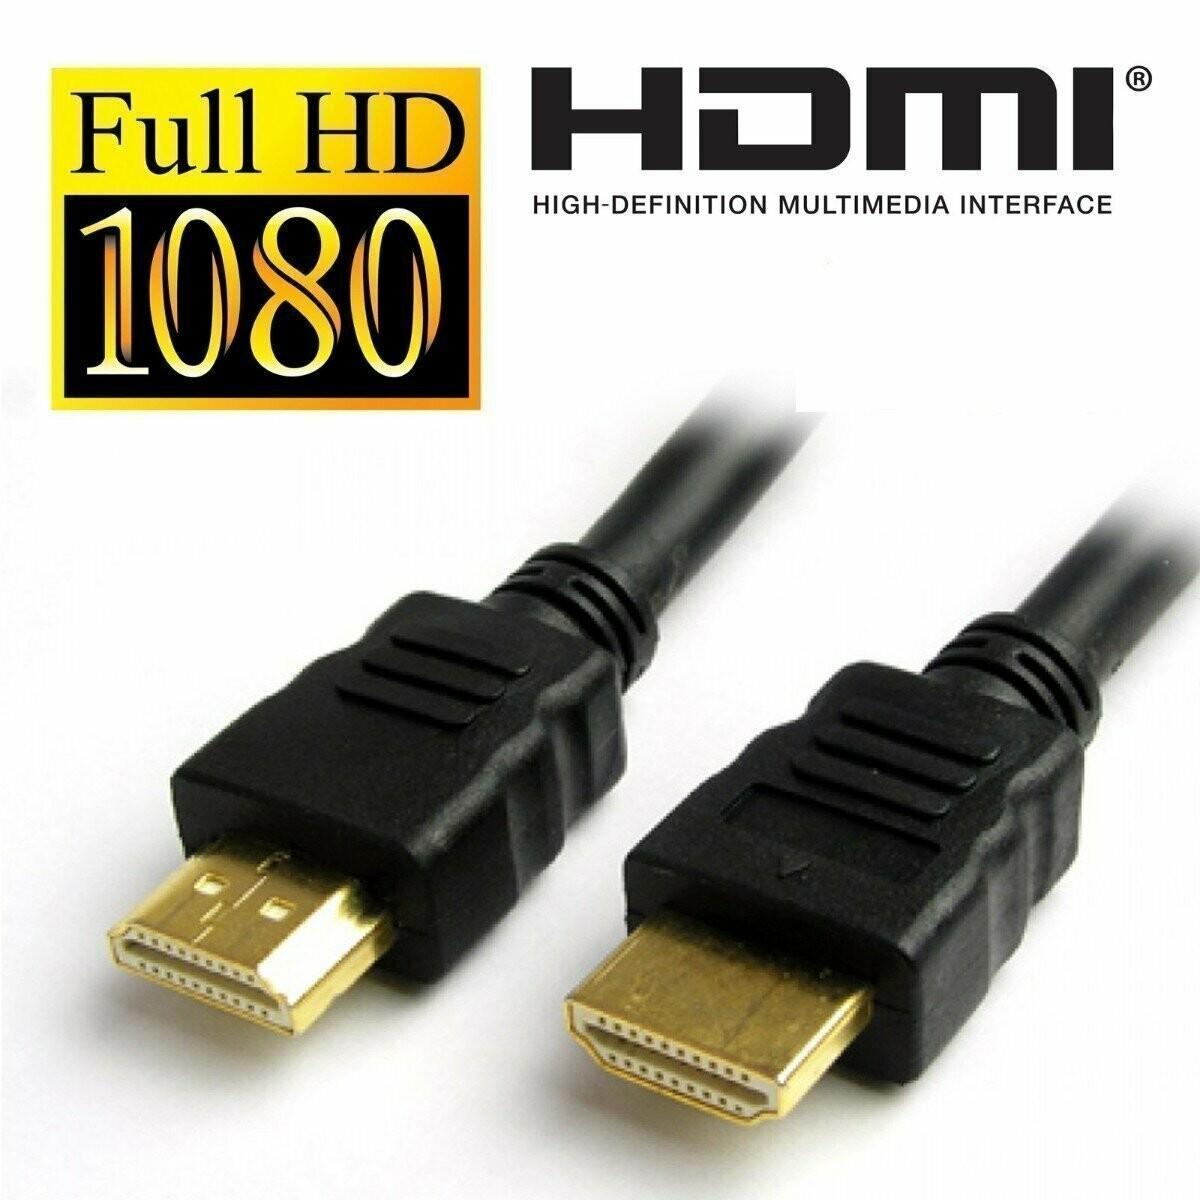 Haze 5mtr HDMI Cable, PVC, Black